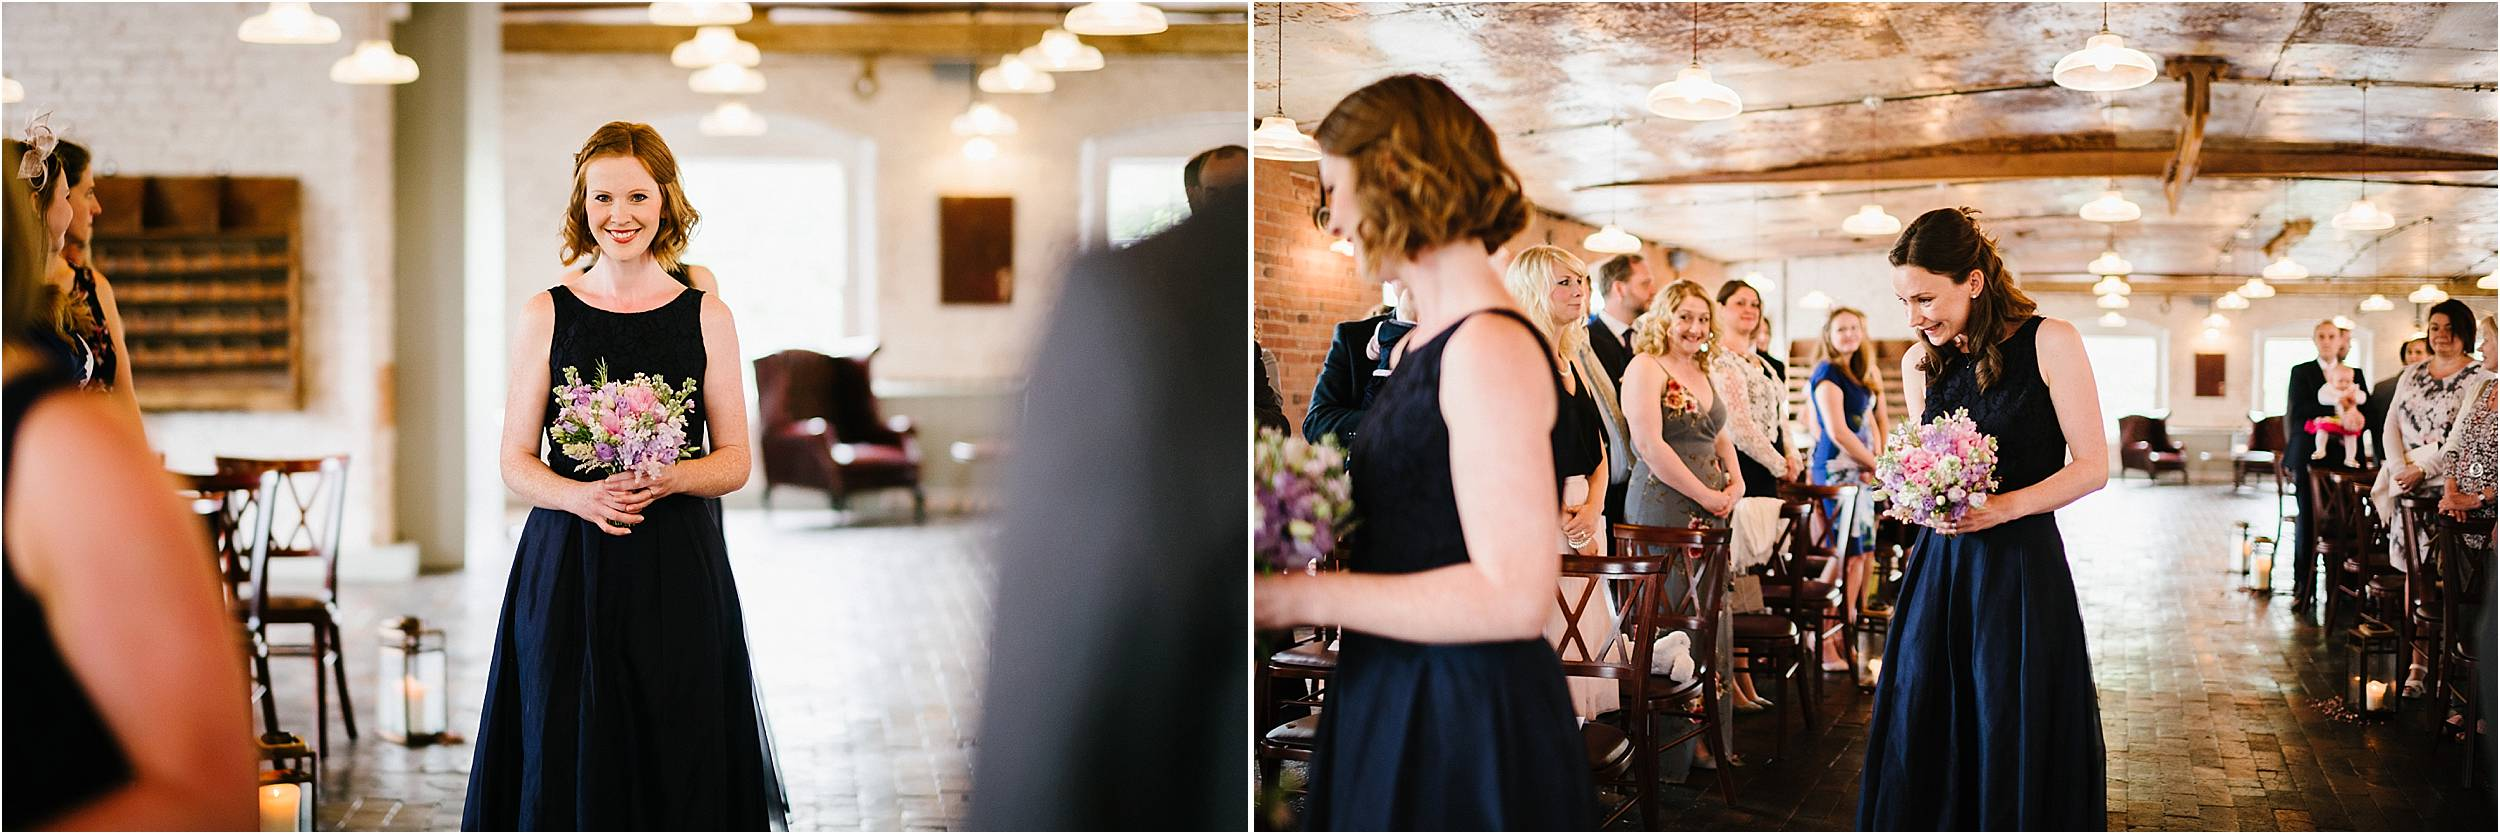 West Mill Derby Wedding Photographer_0057.jpg